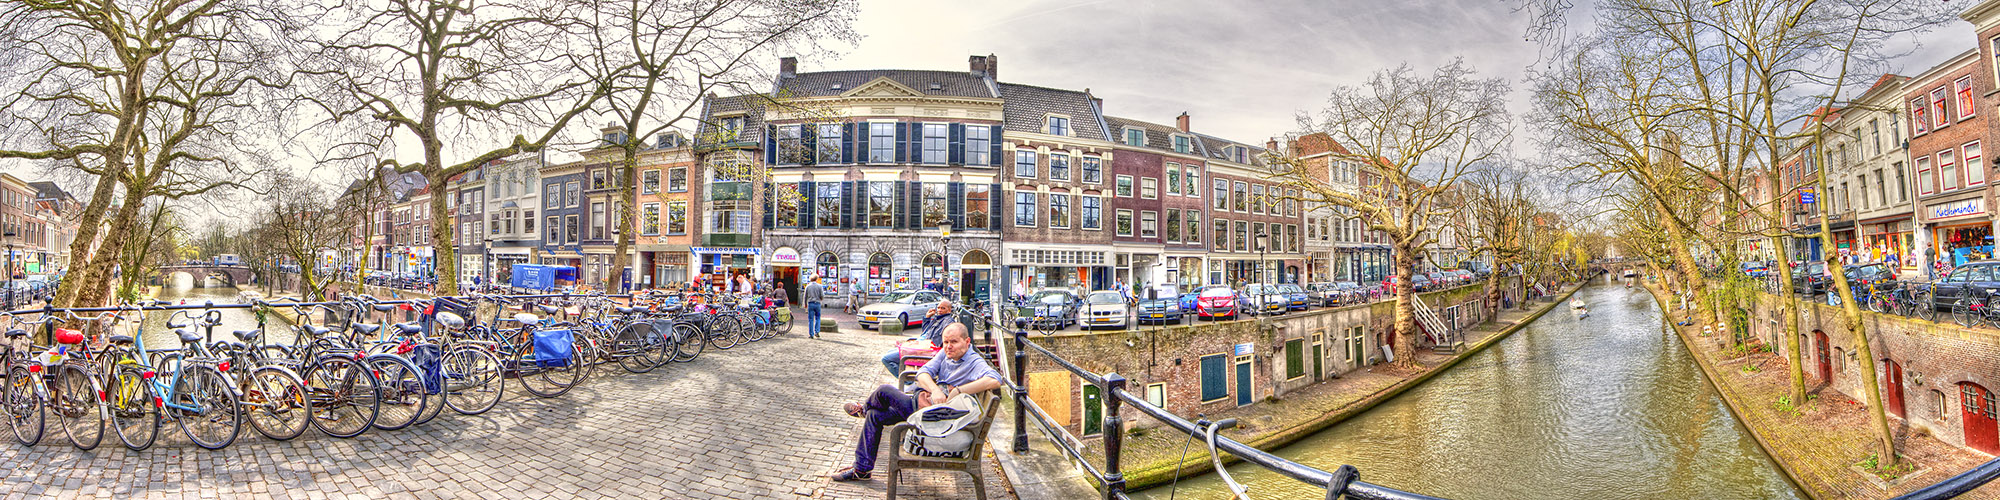 Utrecht fx Panorama HDR 2 09